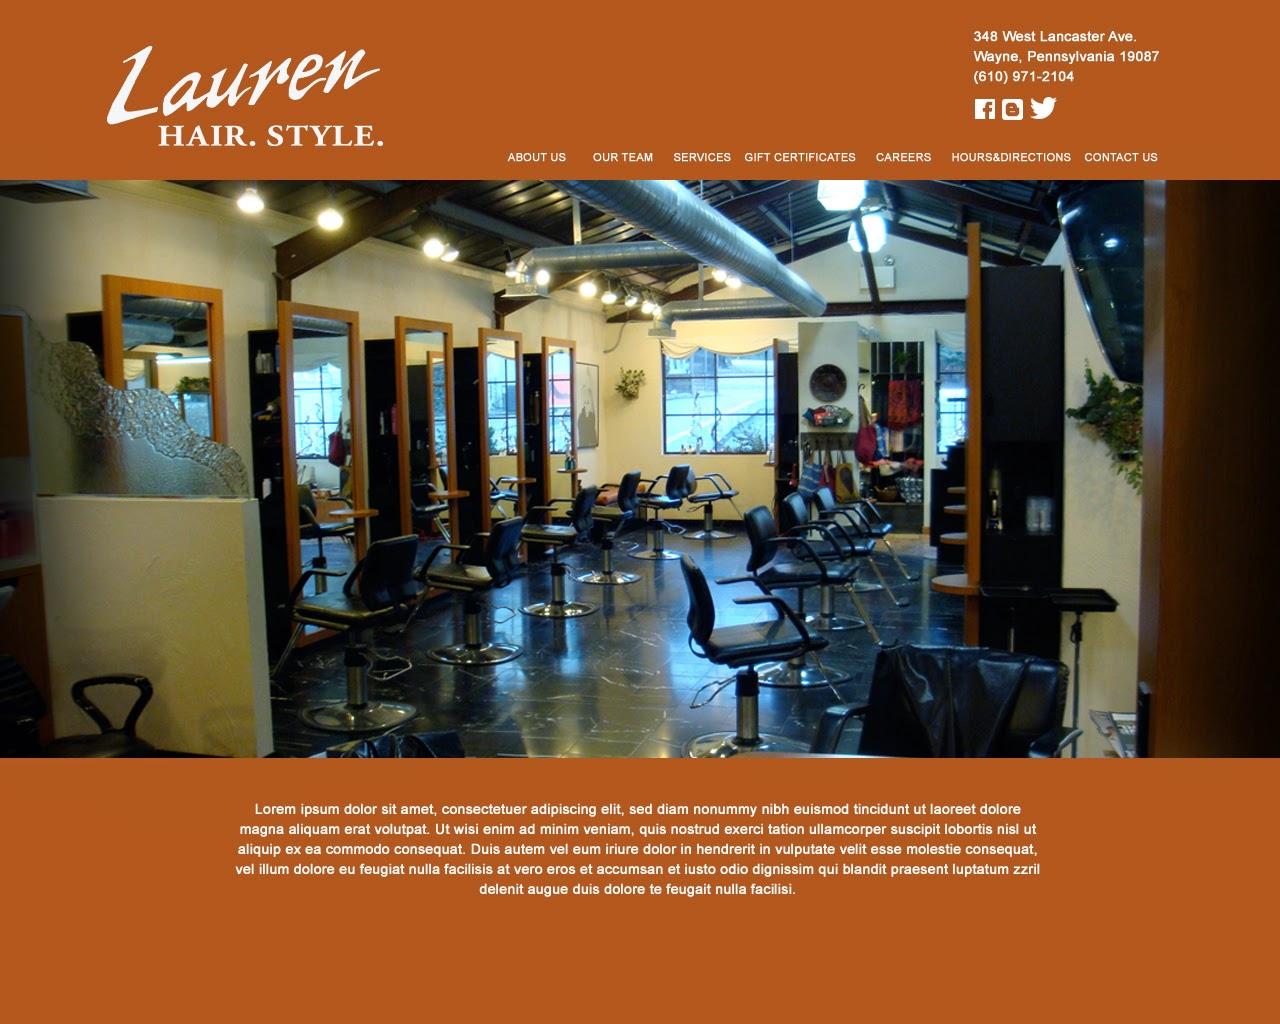 www.laurenhairstyle.com